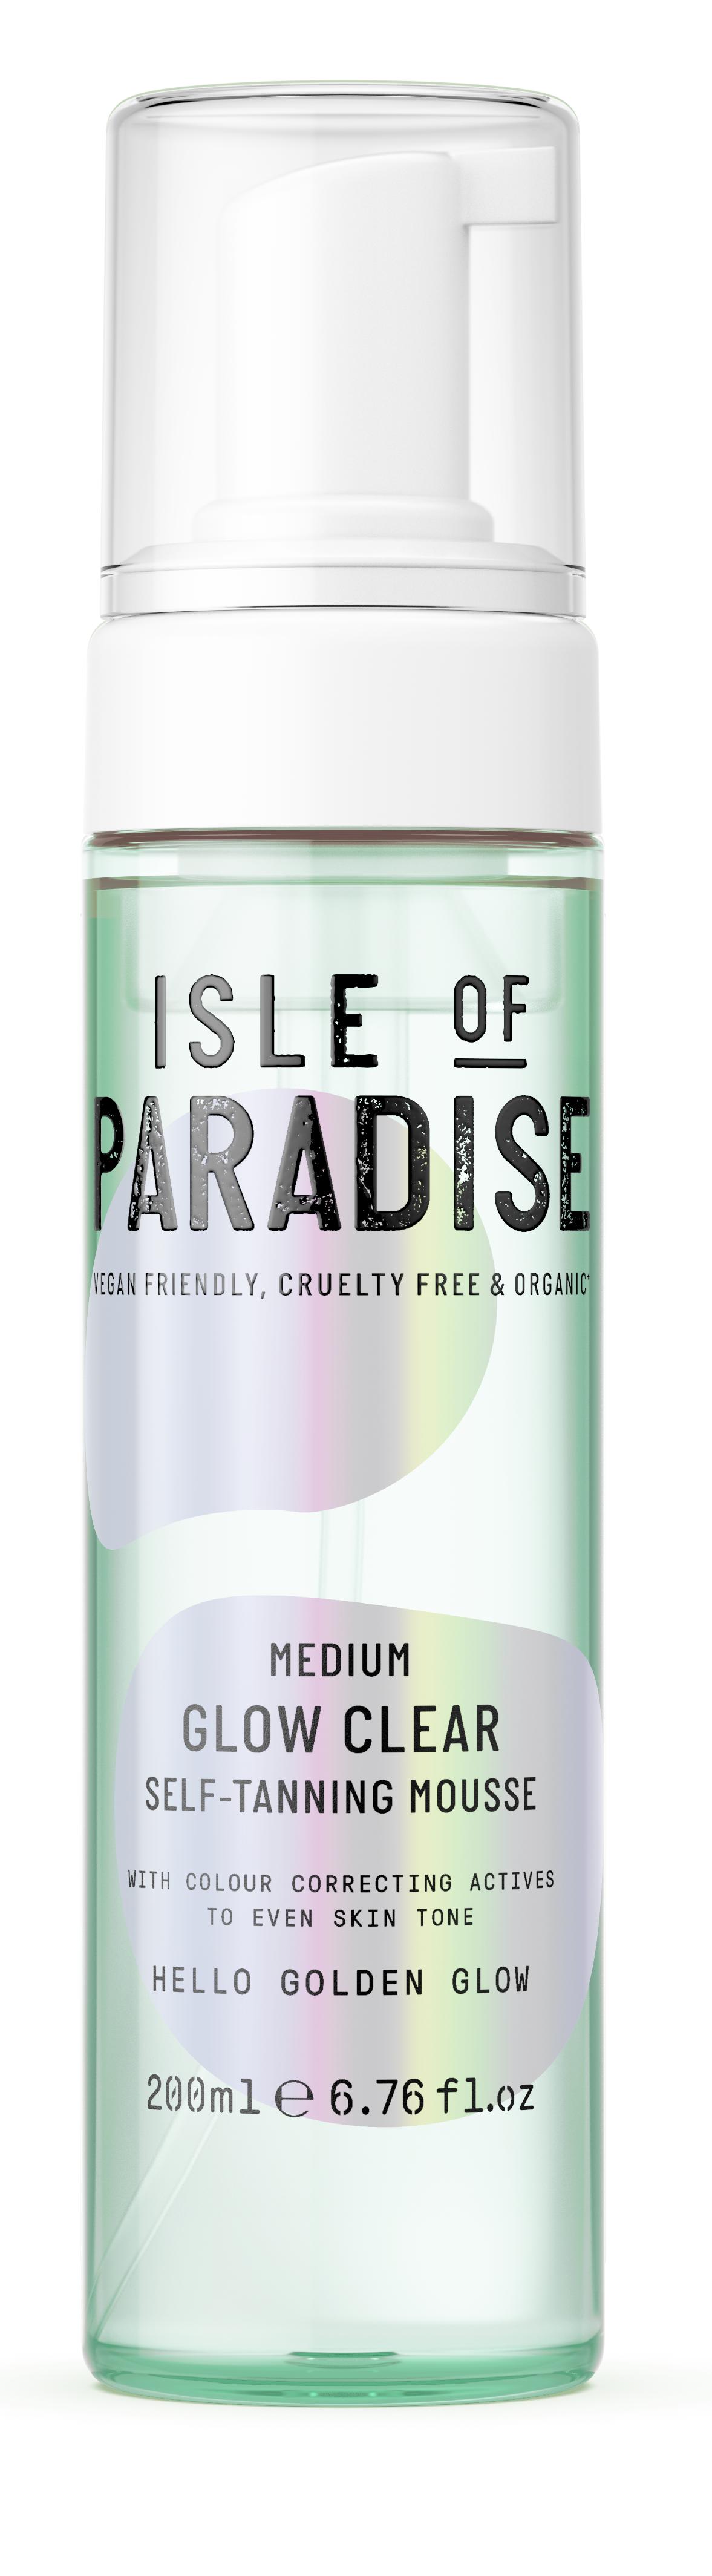 Isle of Paradise - Medium Glow Clear Self Tanning Mousse 200 ml